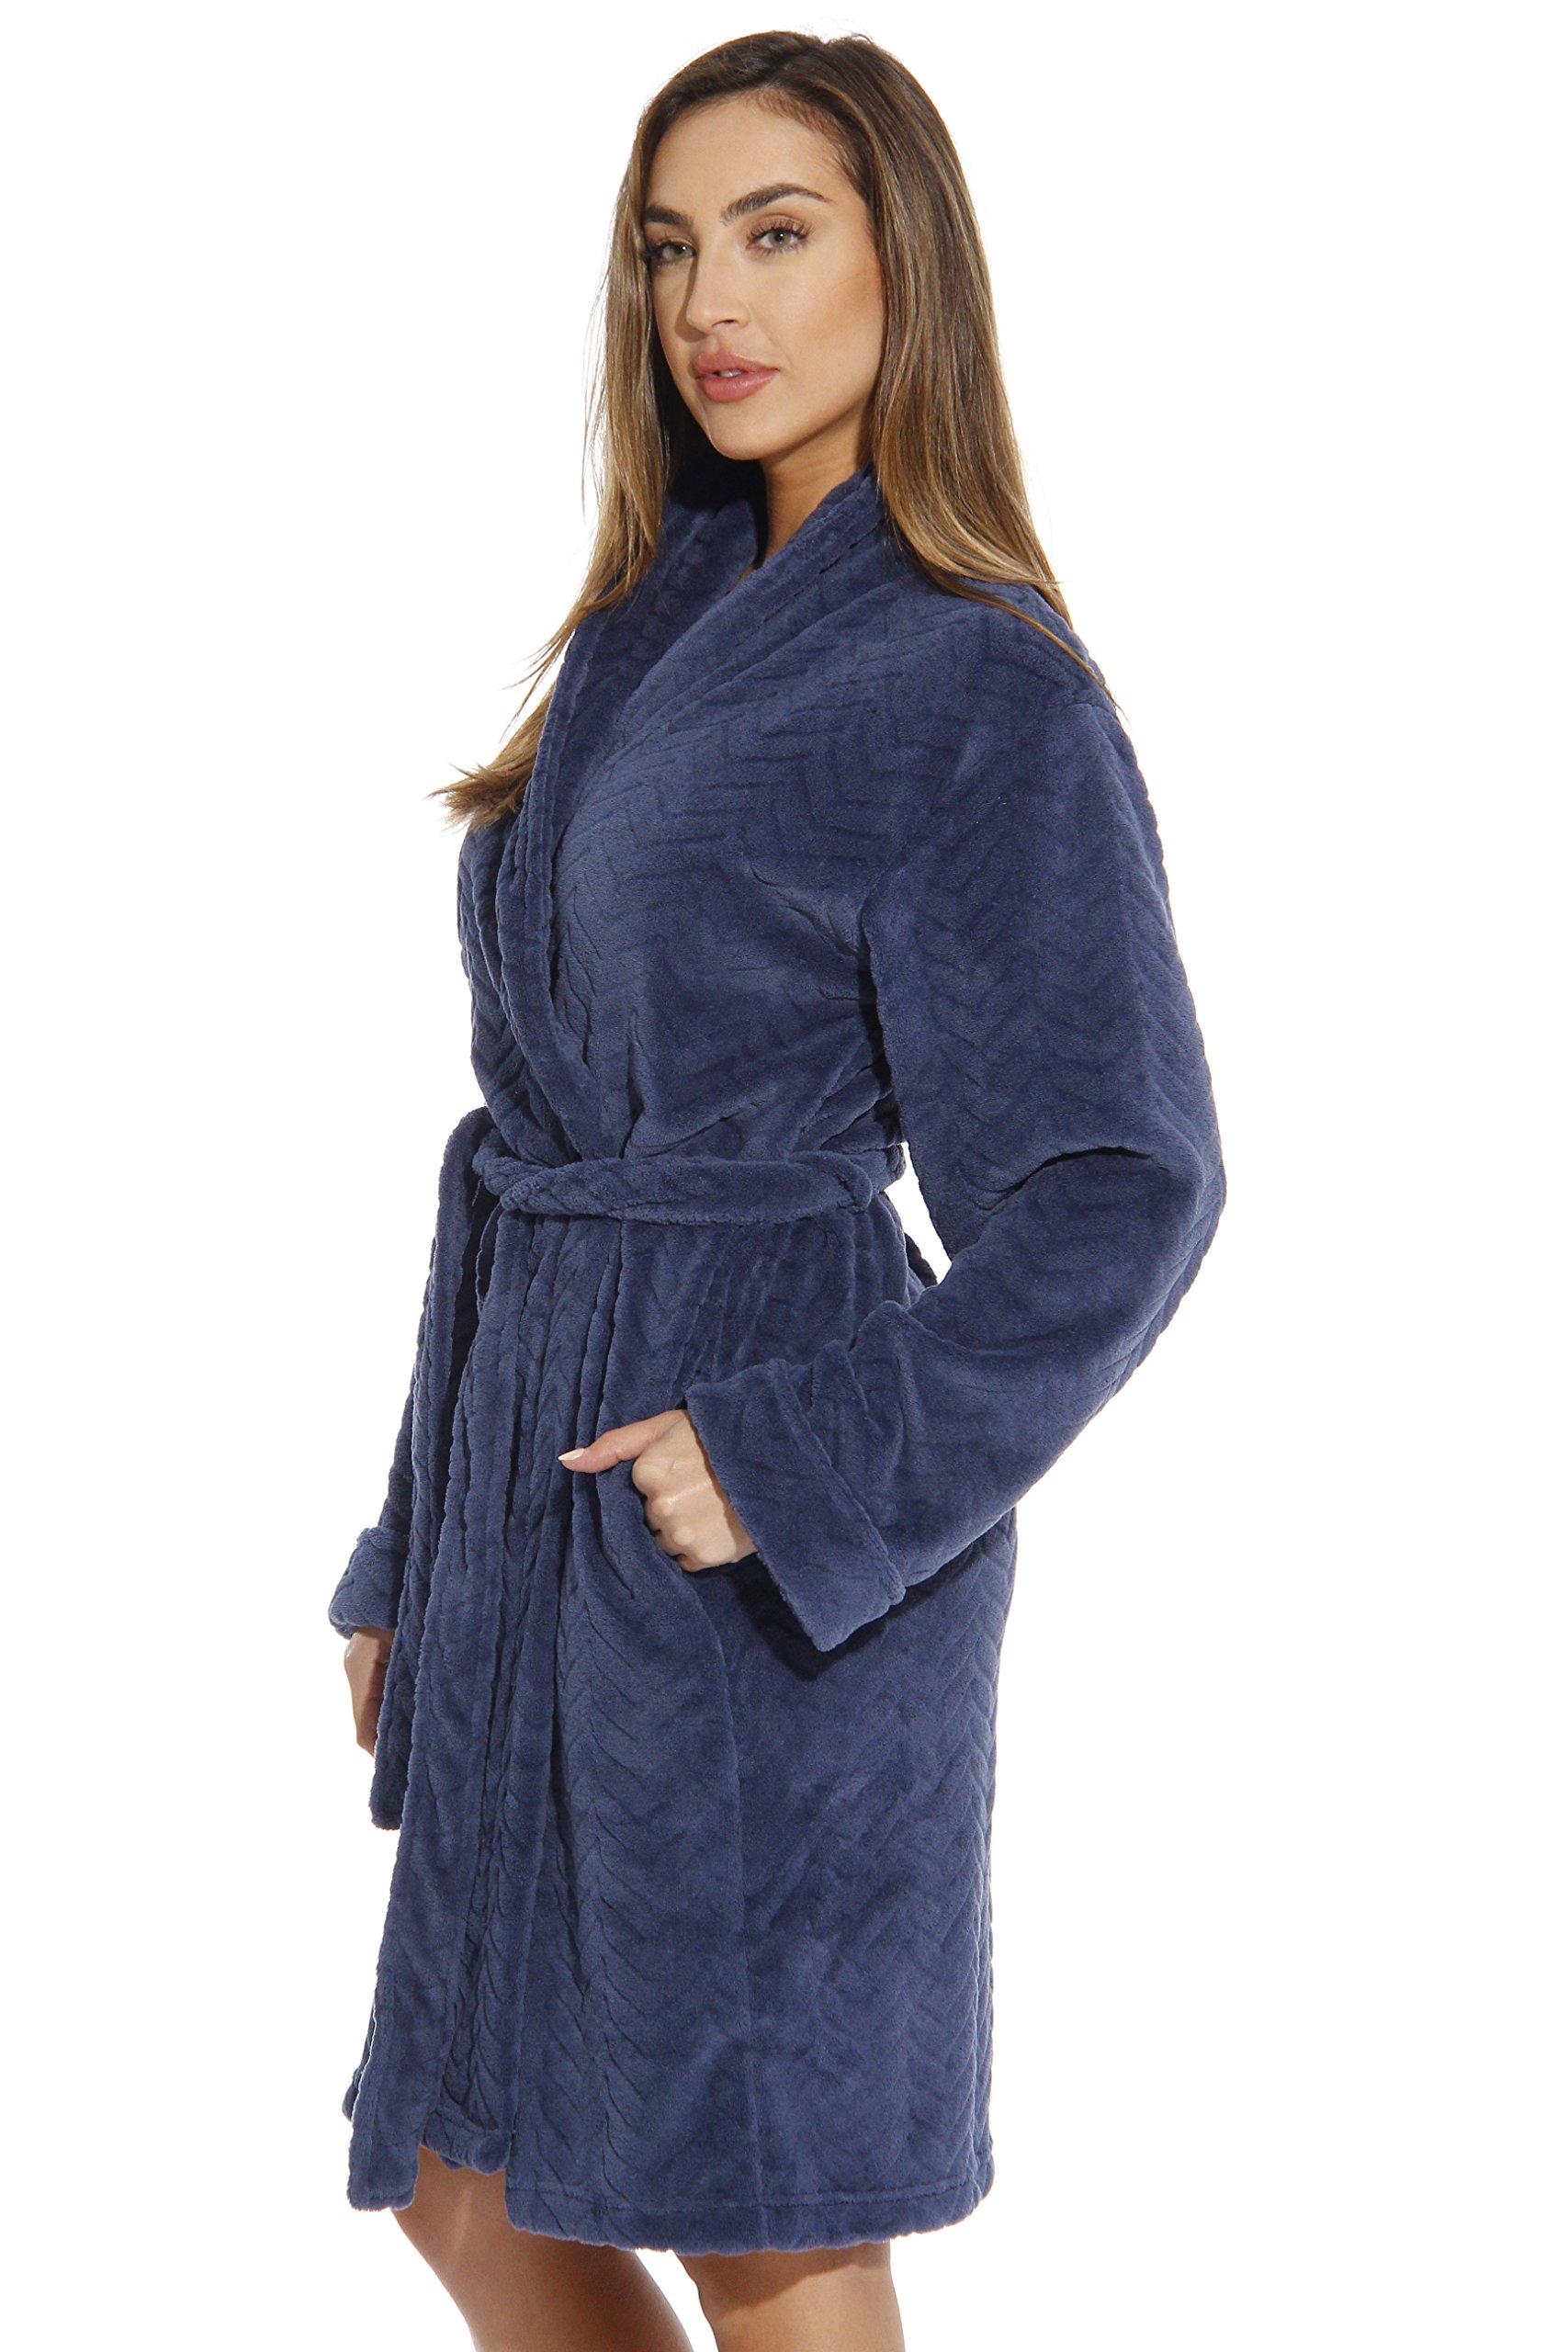 Just Love Kimono Robe Velour Chevron Texture Bath Robes for Women, Navy, Medium by Just Love (Image #2)